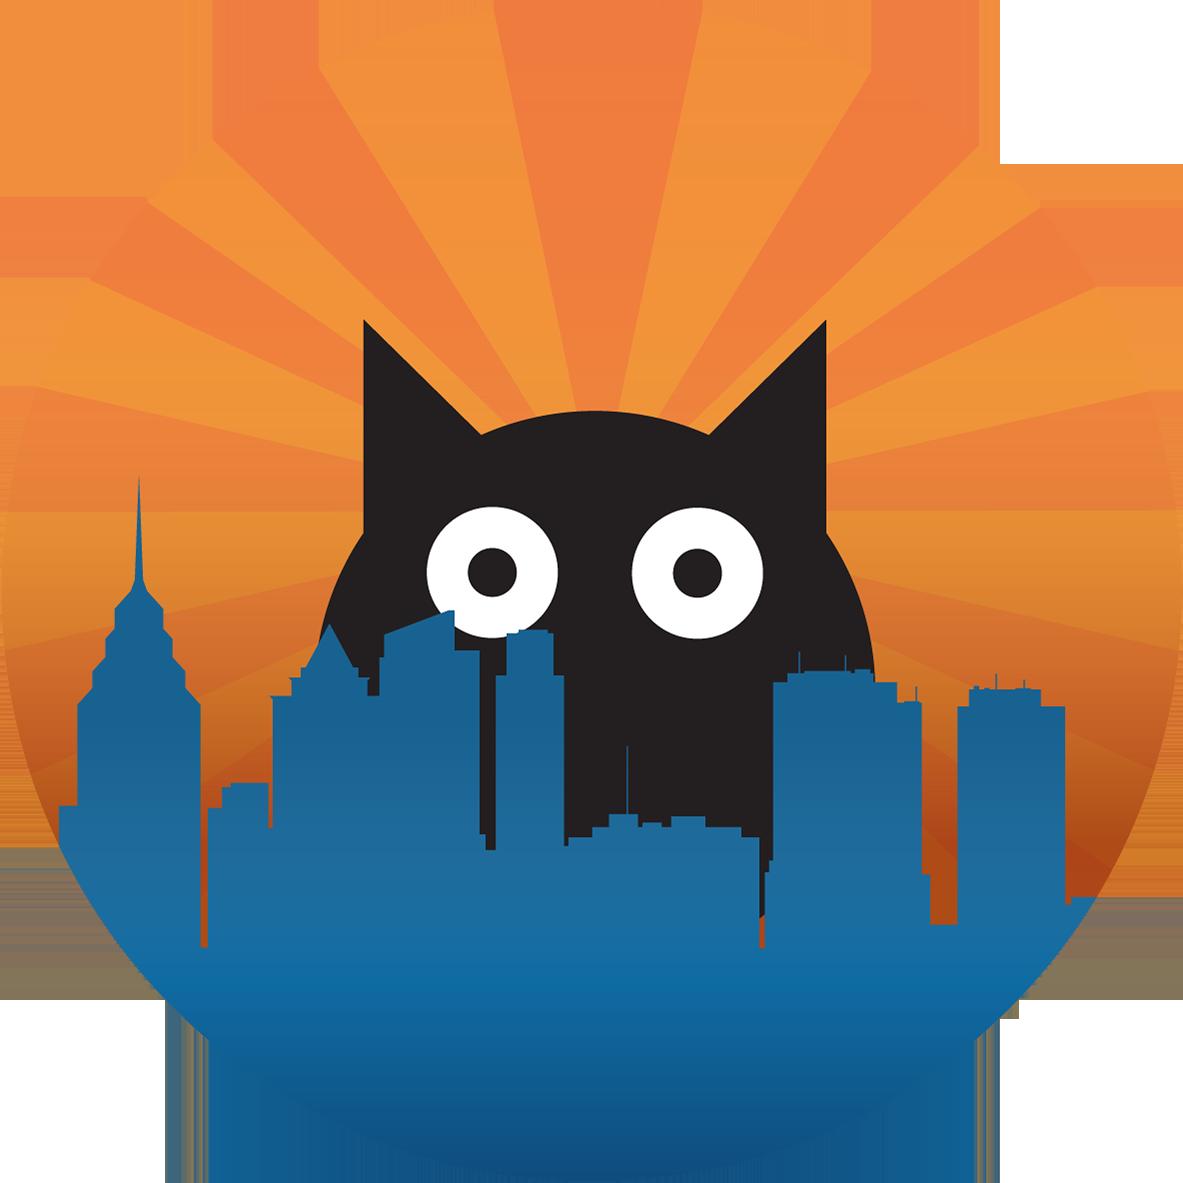 Catsbury_circular logos-13_WEB.png